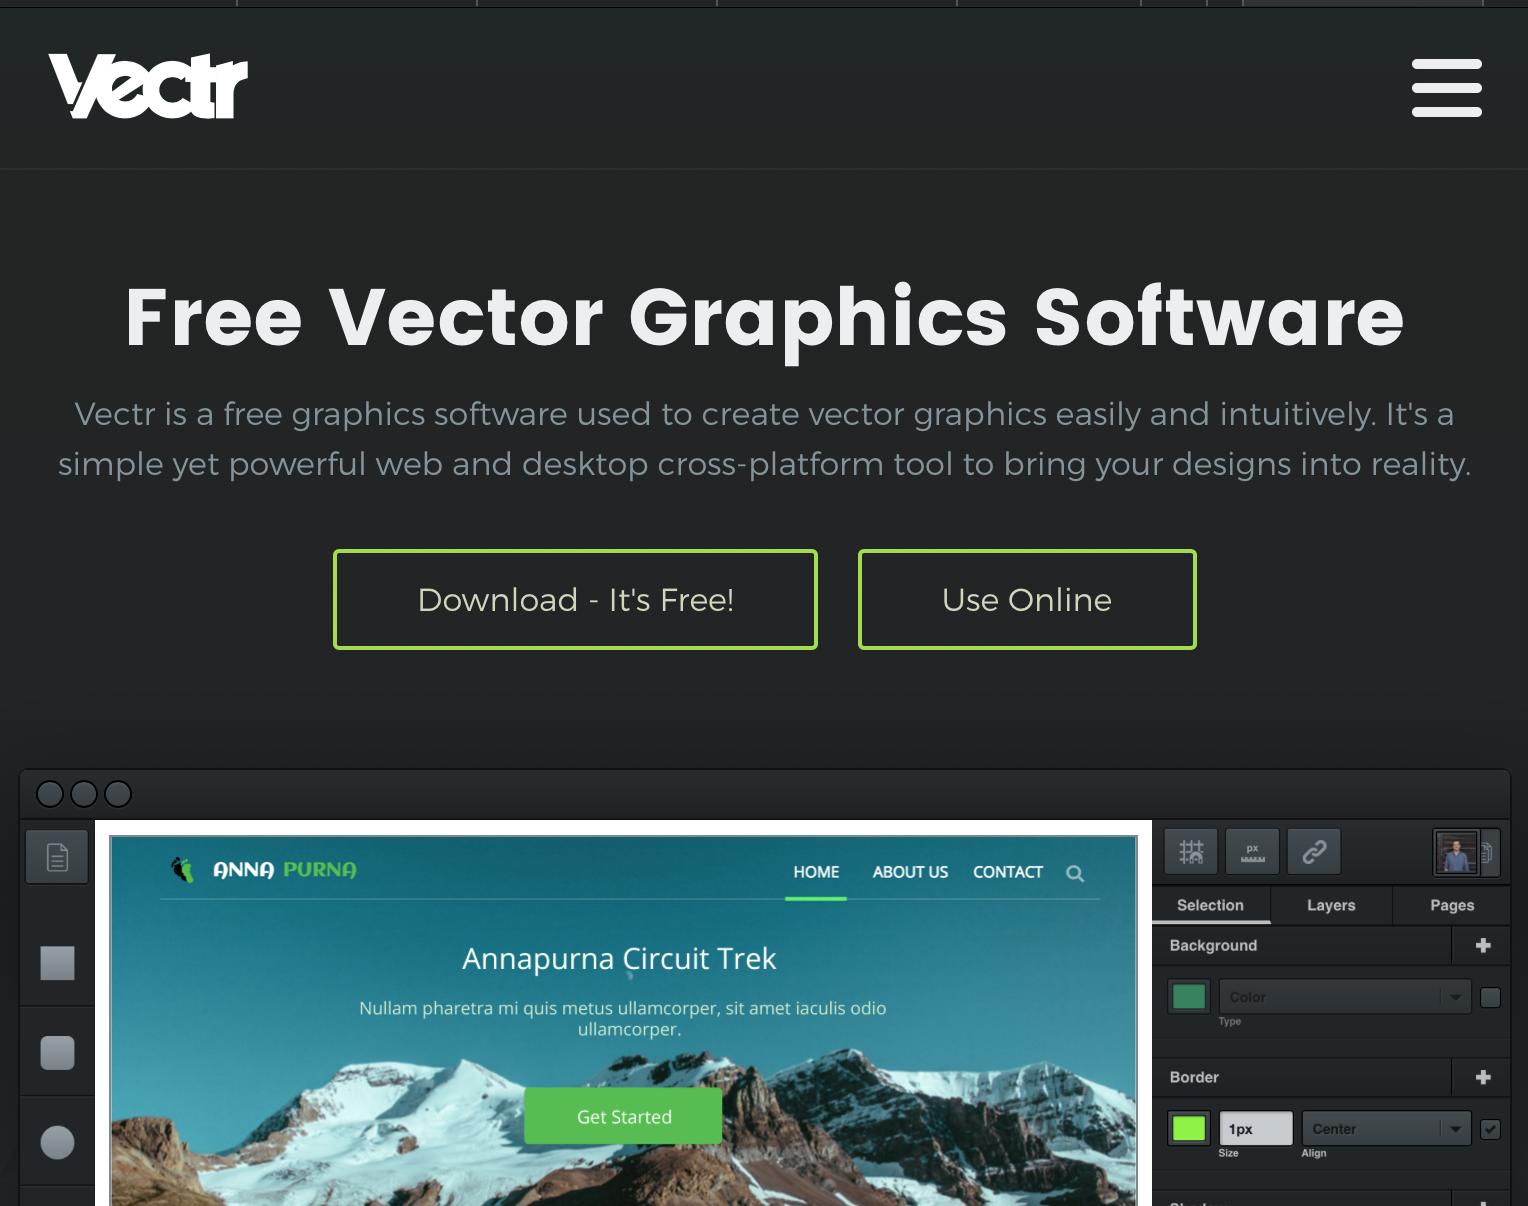 Free Vector Editing Software - Vectr.com